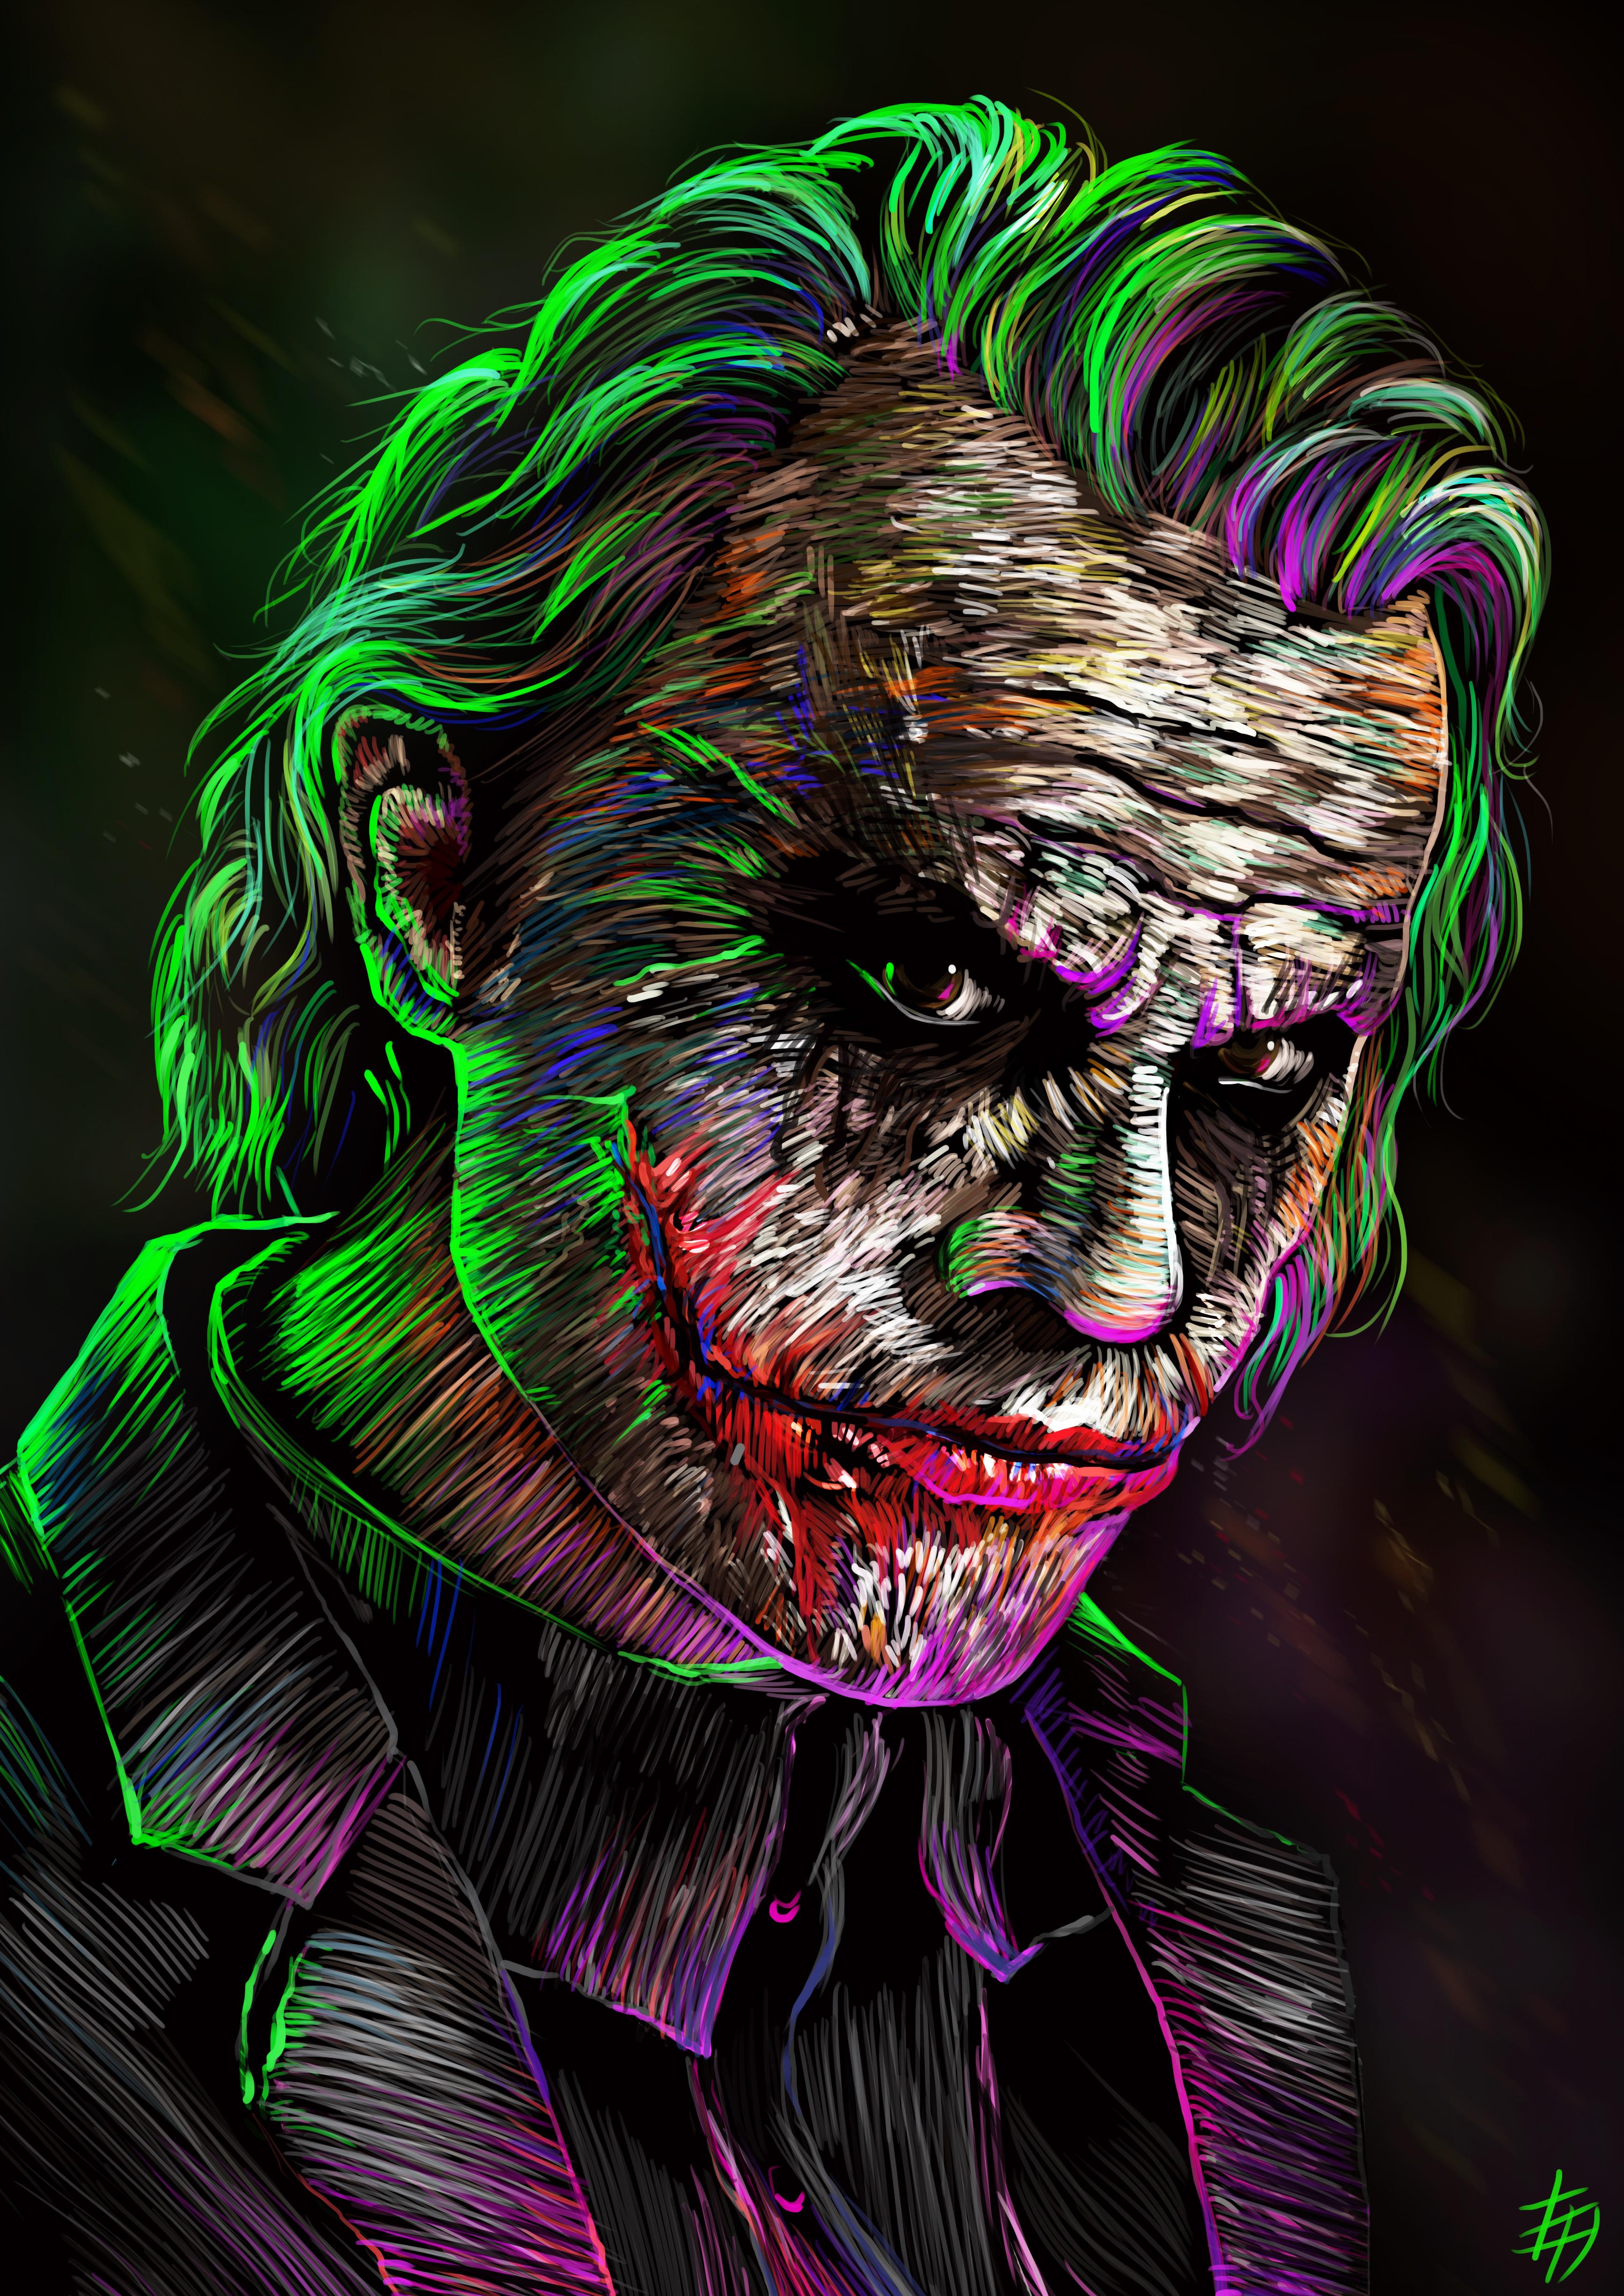 Joker 4k digital art hd superheroes 4k wallpapers for Joker wallpaper 4k